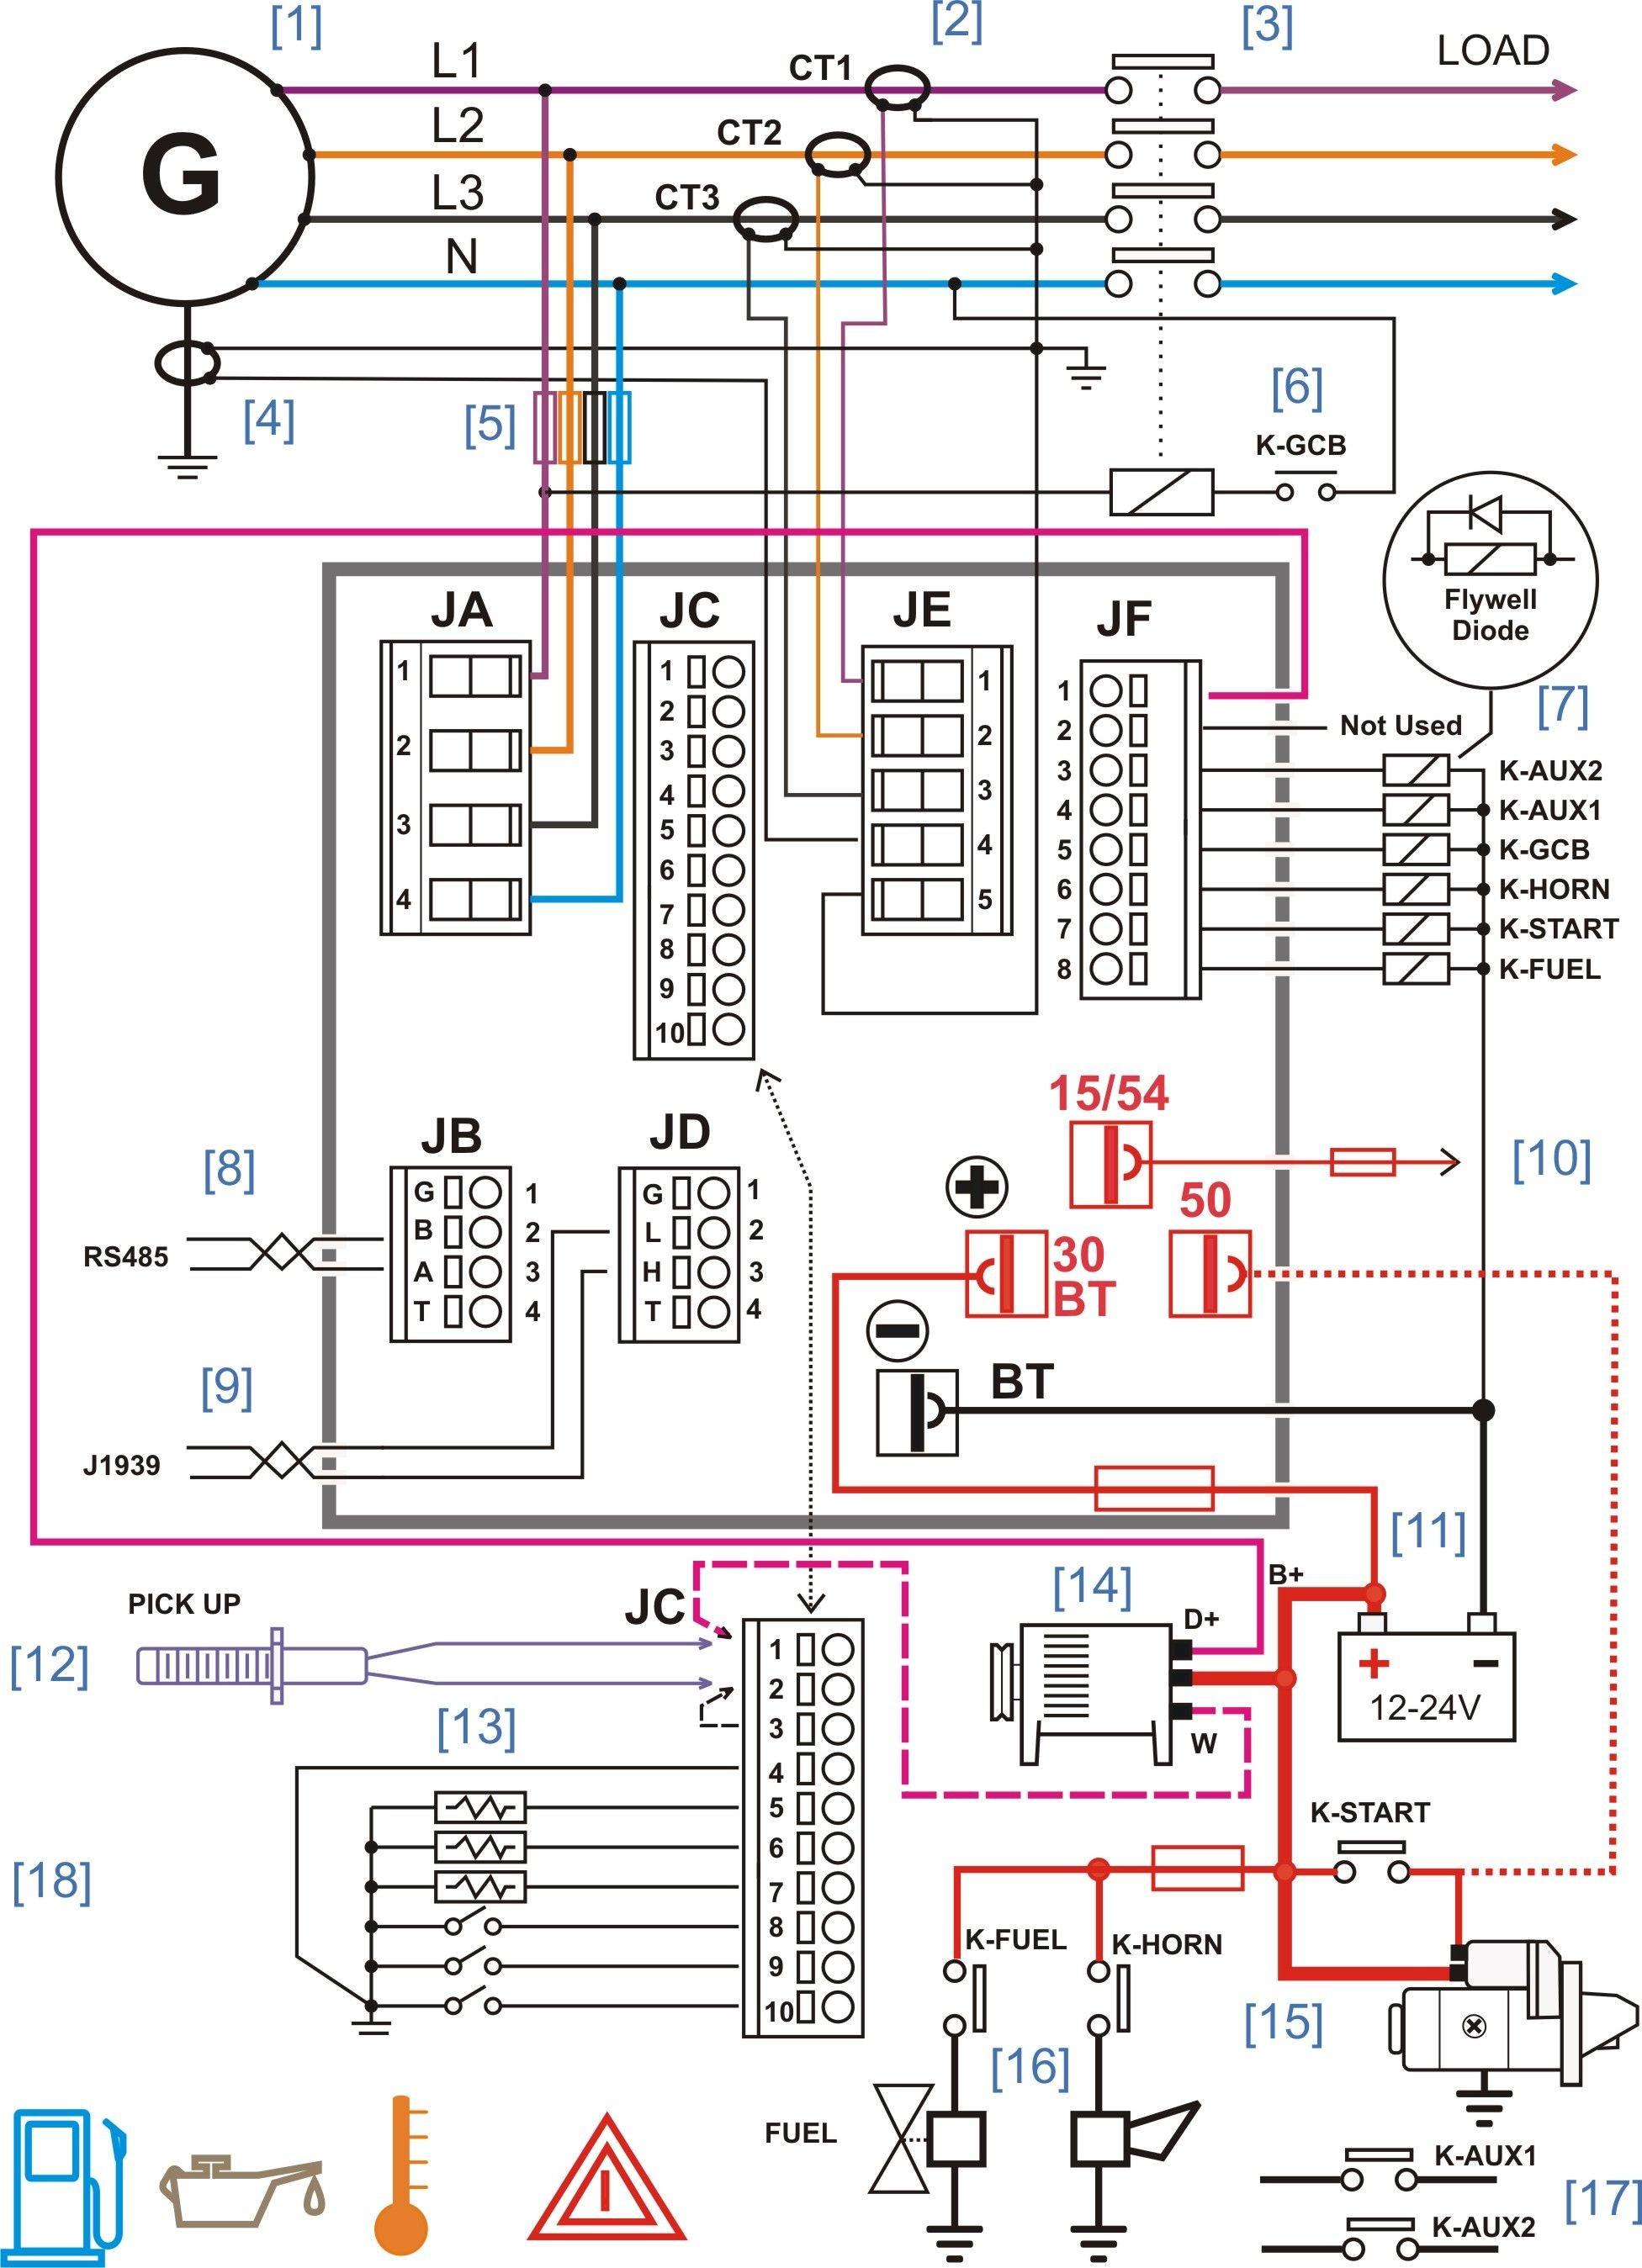 Volvo S80 Parts Diagram Great Design Of Wiring 2 9 Engine Diesel And Function Rh Detoxicrecenze Com Headlight Catalog